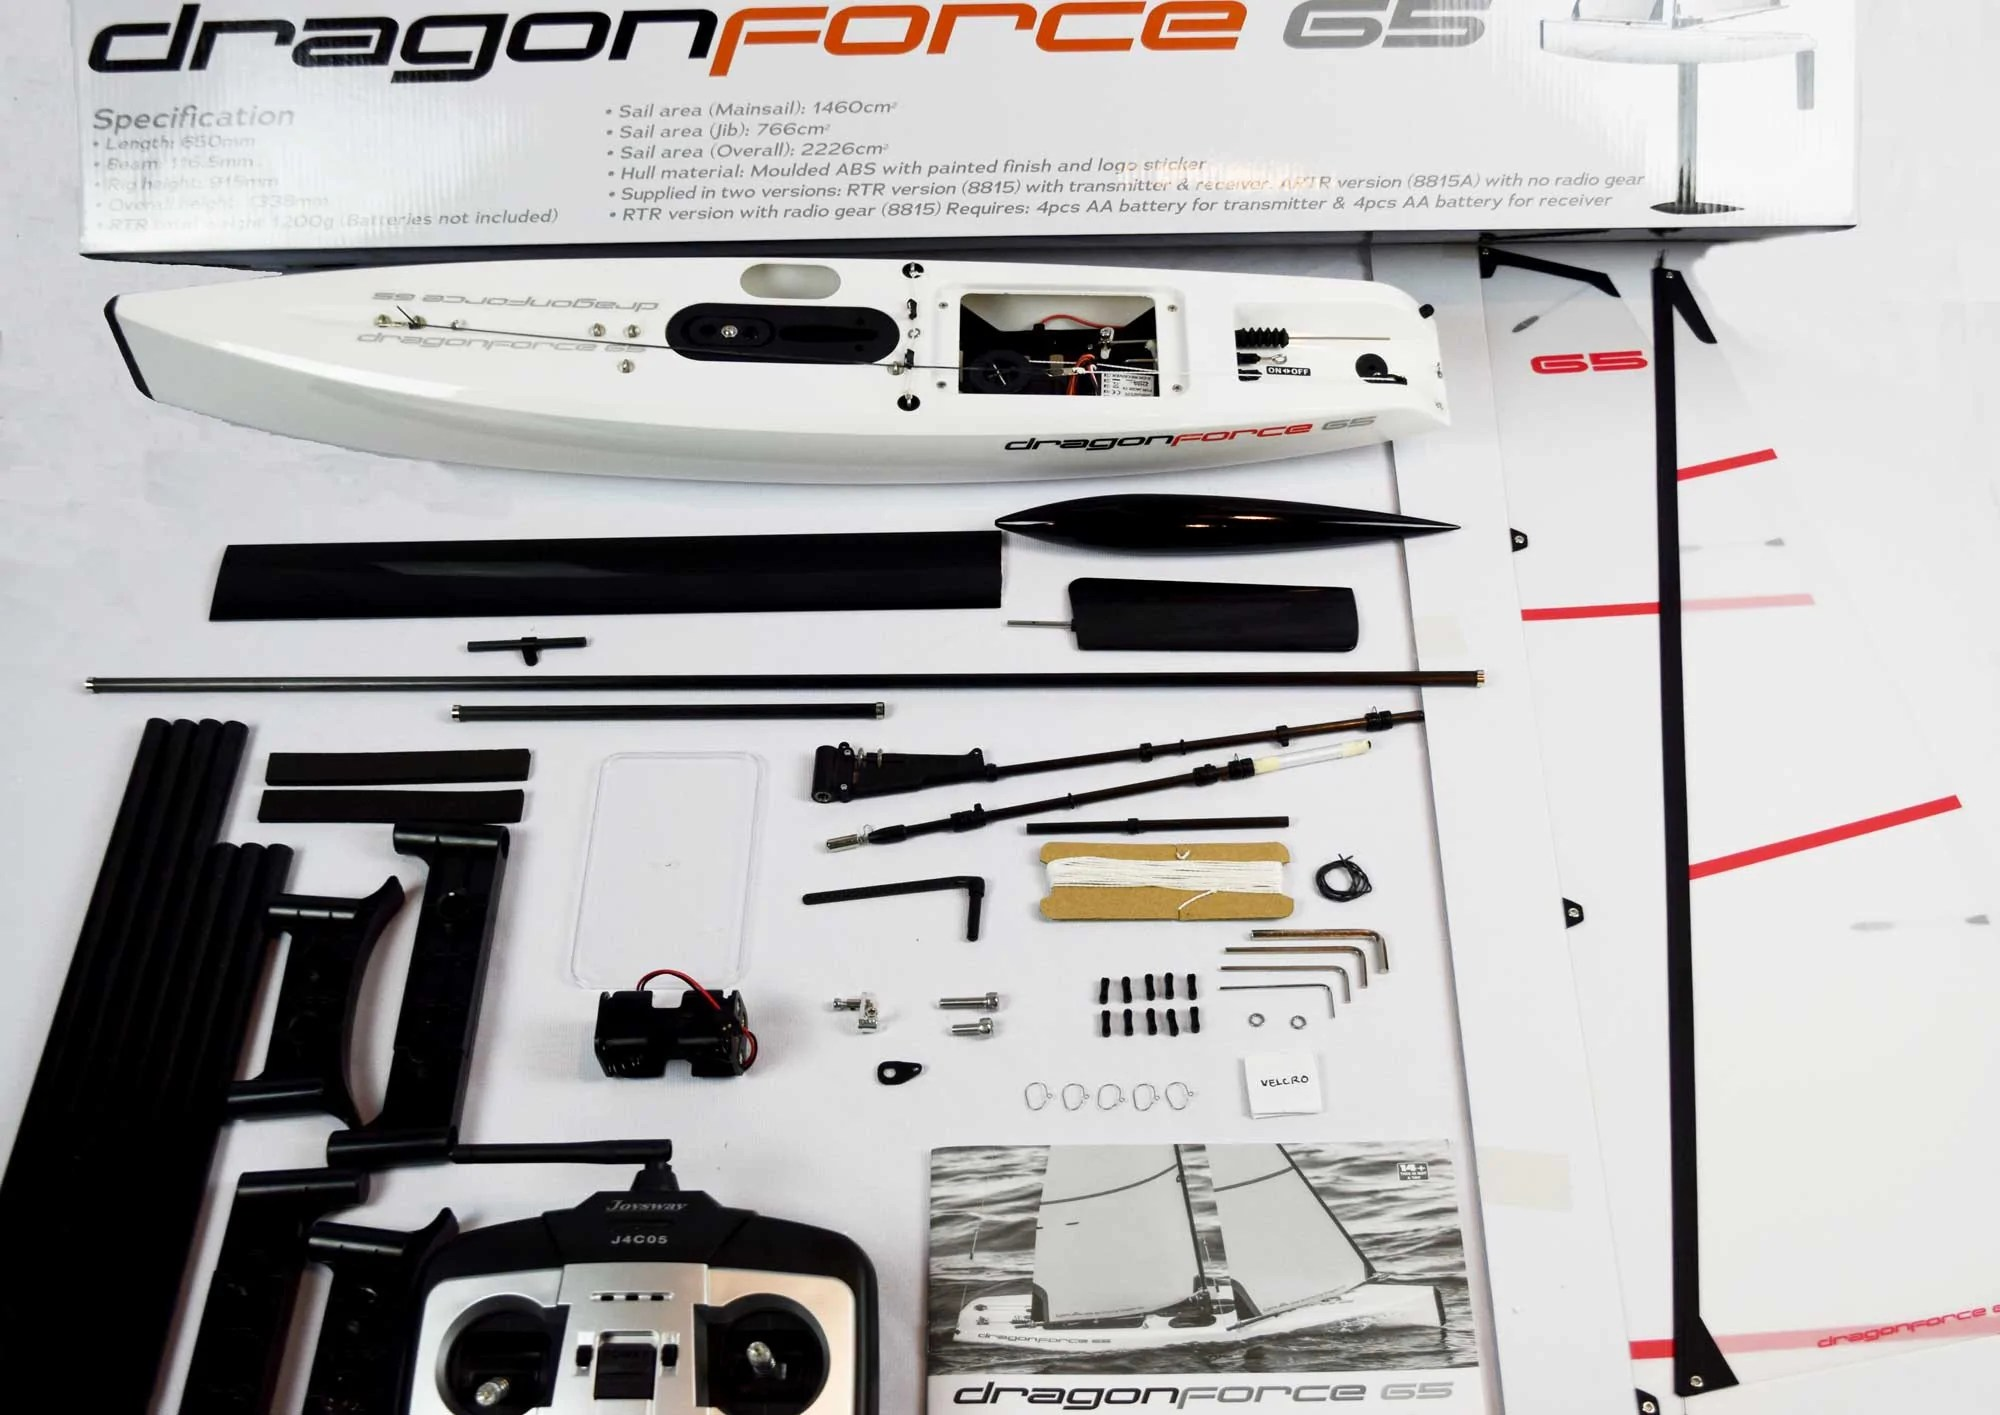 dragonforce 65 2019 version 6 650mm df65 class rc sailboat [ 2000 x 1415 Pixel ]